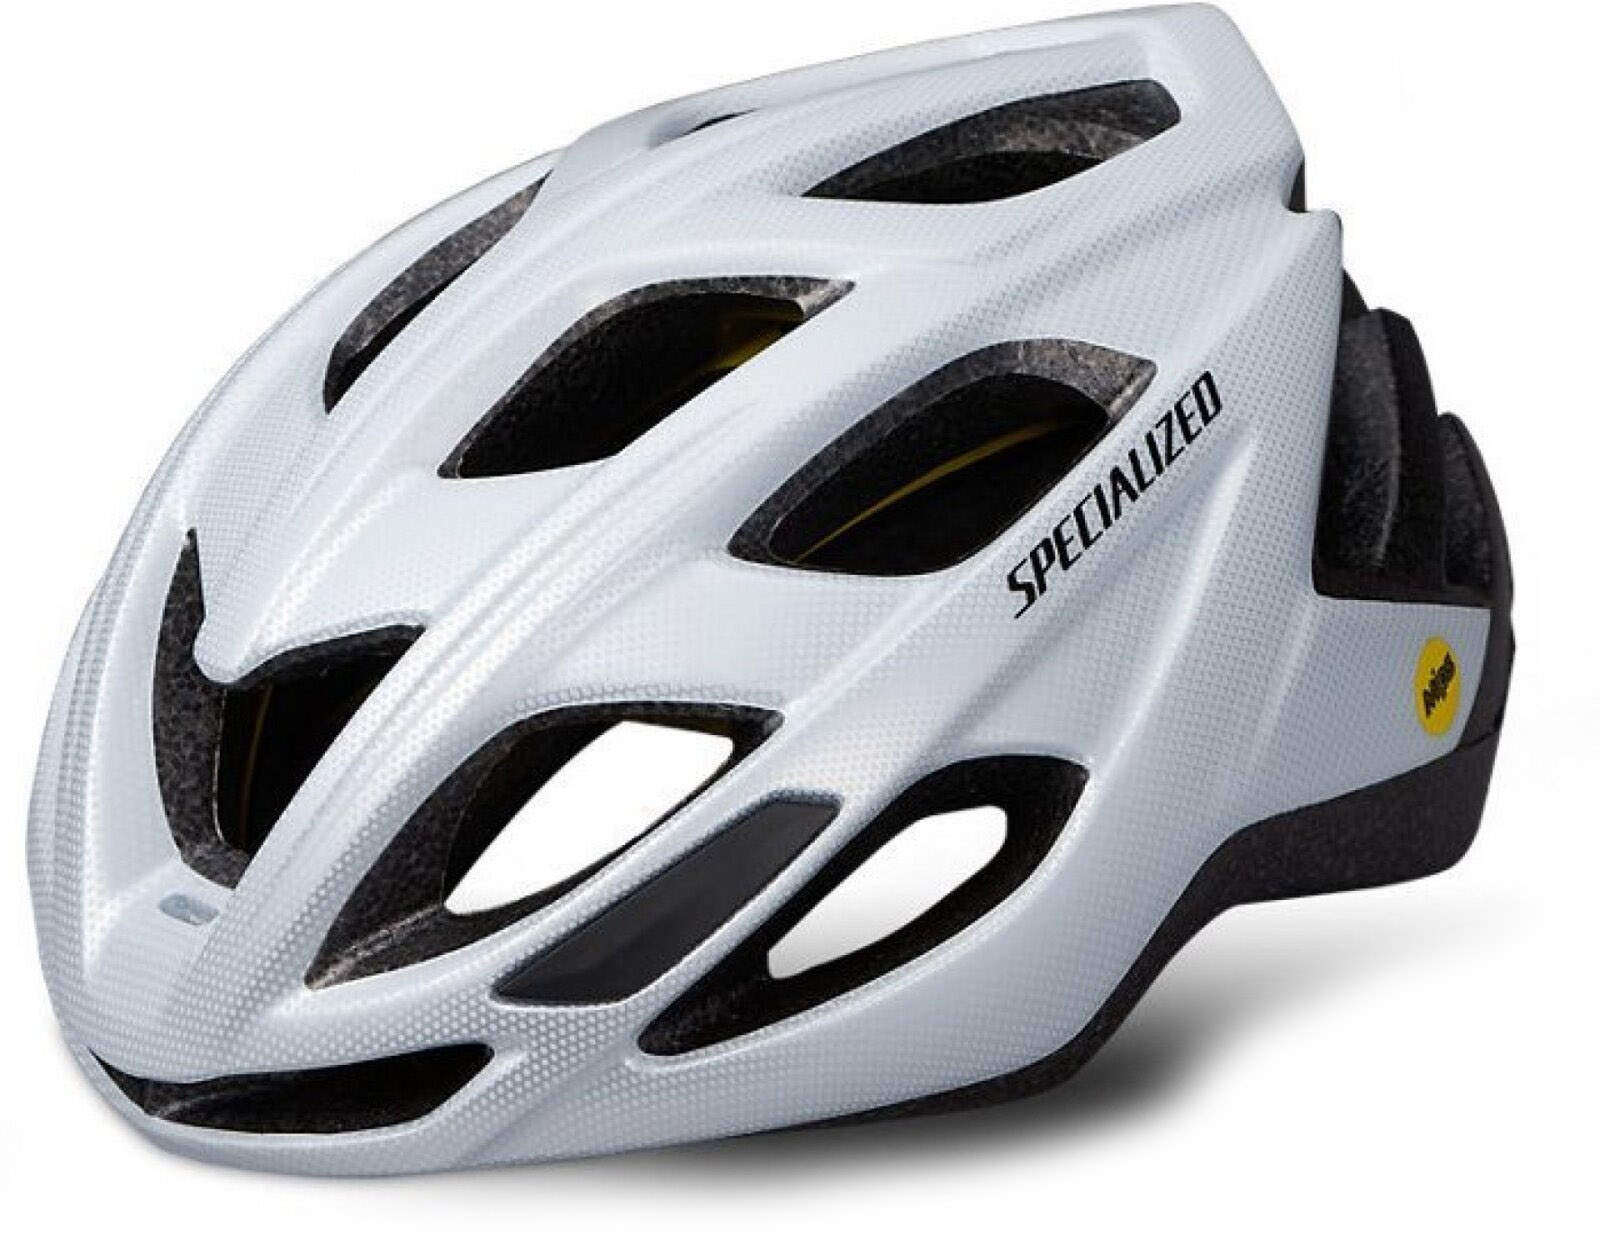 Specialized Chamonix Mips cykelhjelm - Hvid